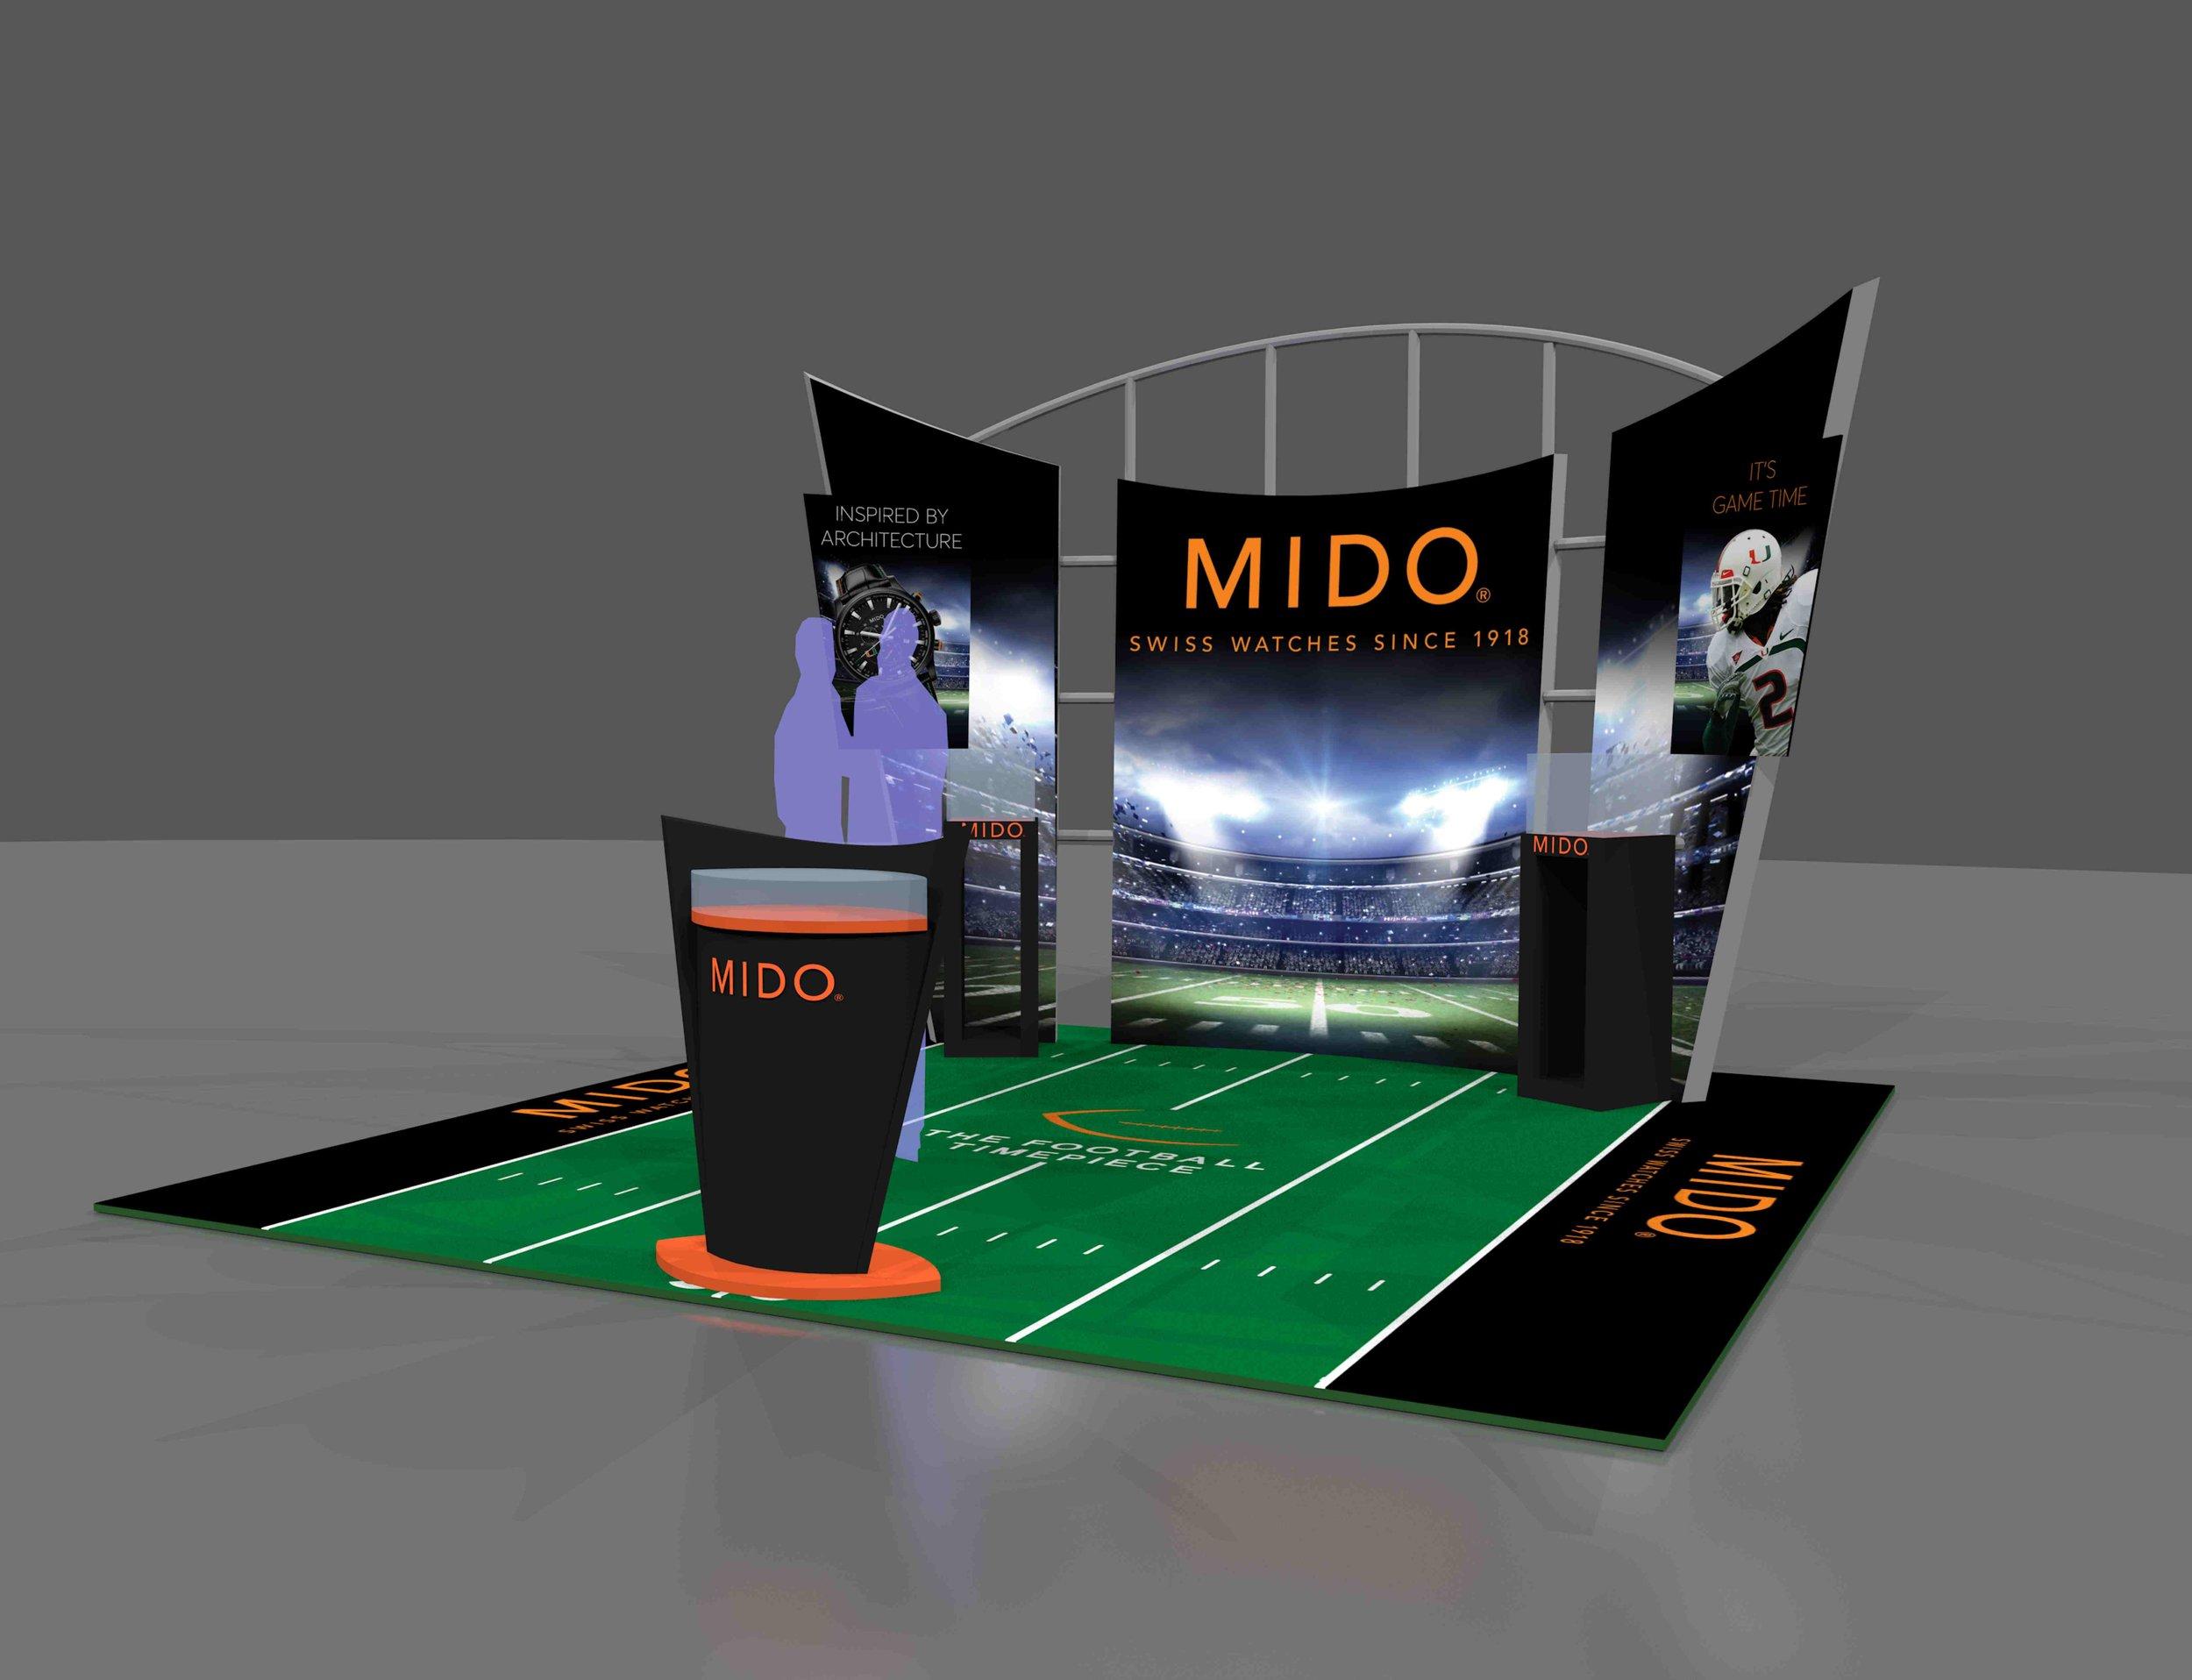 MIDO_15x15_Render4A_update.jpg